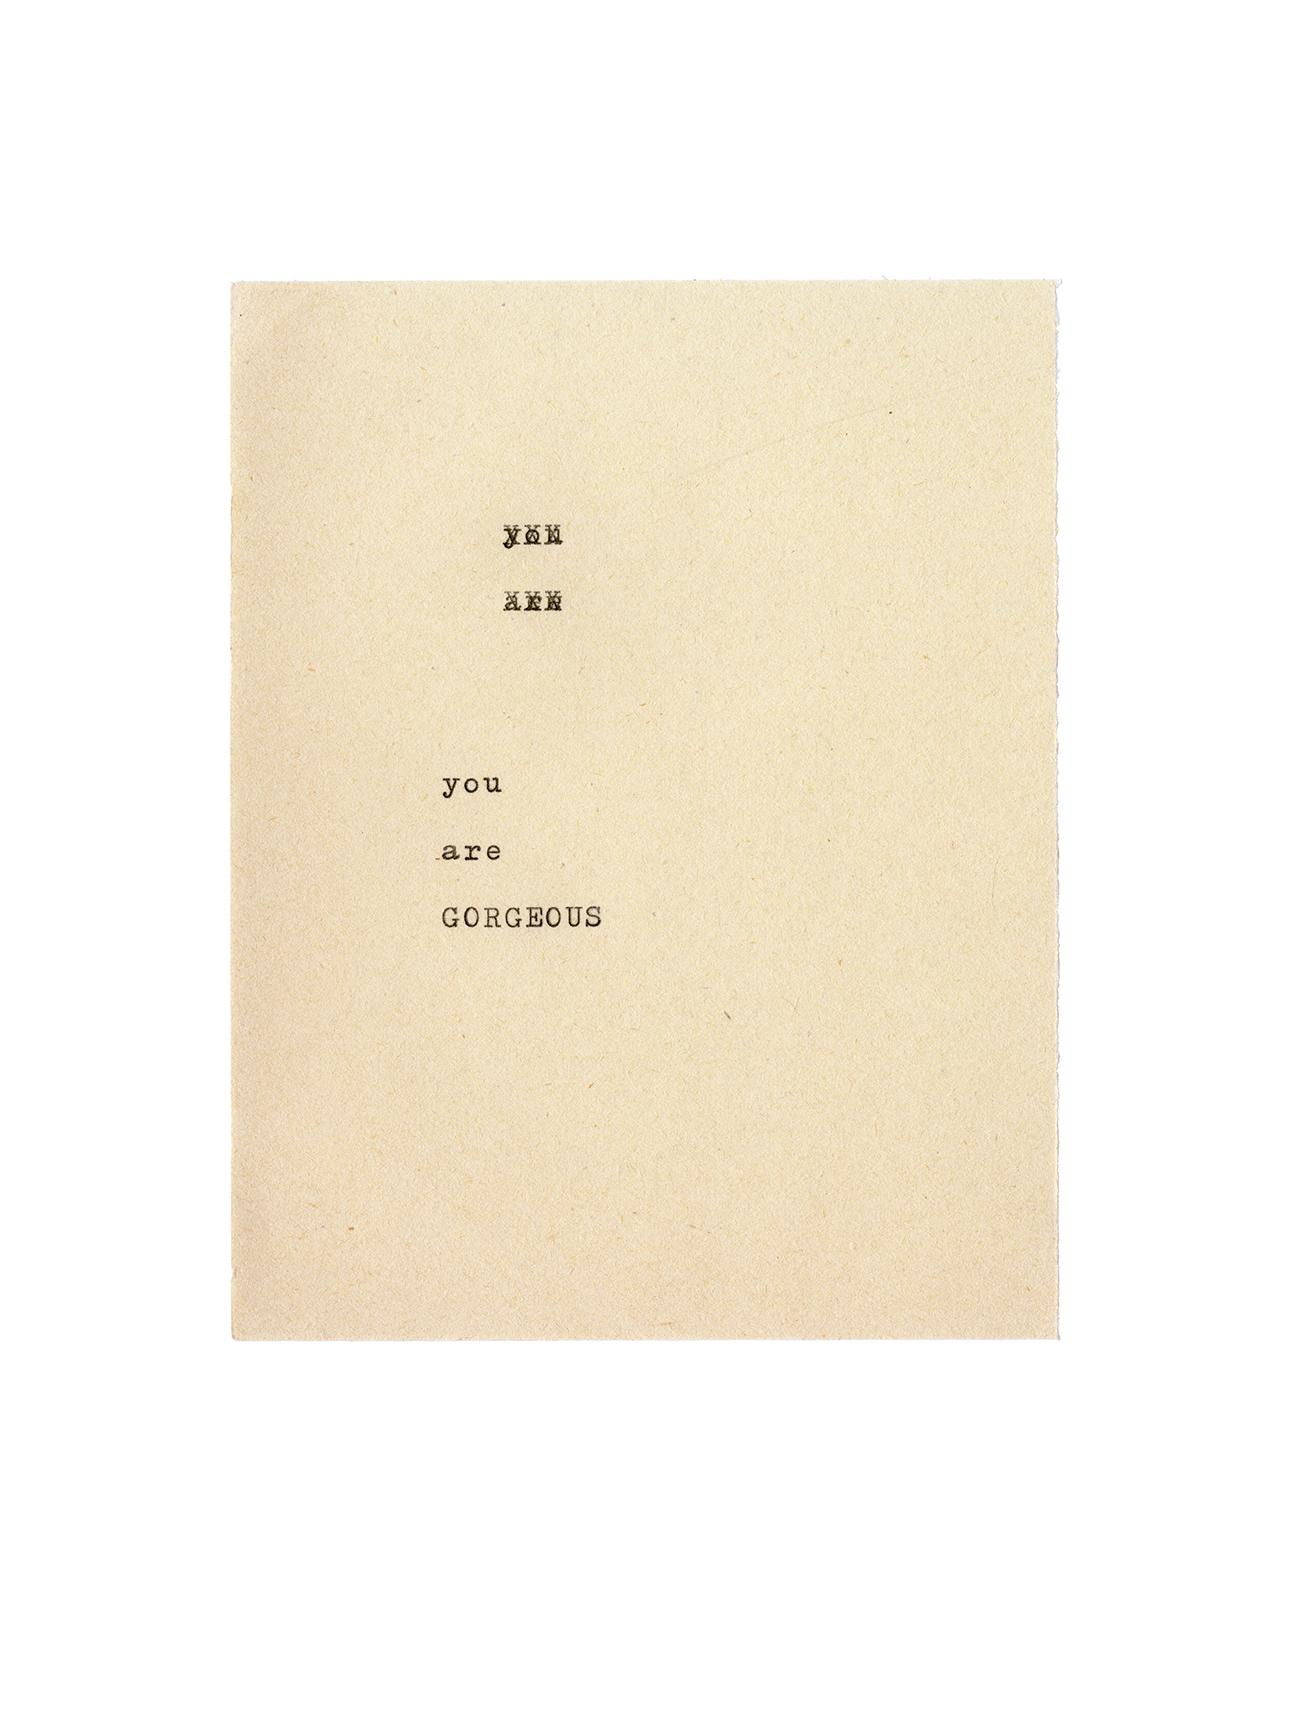 Poems36 copy.jpg